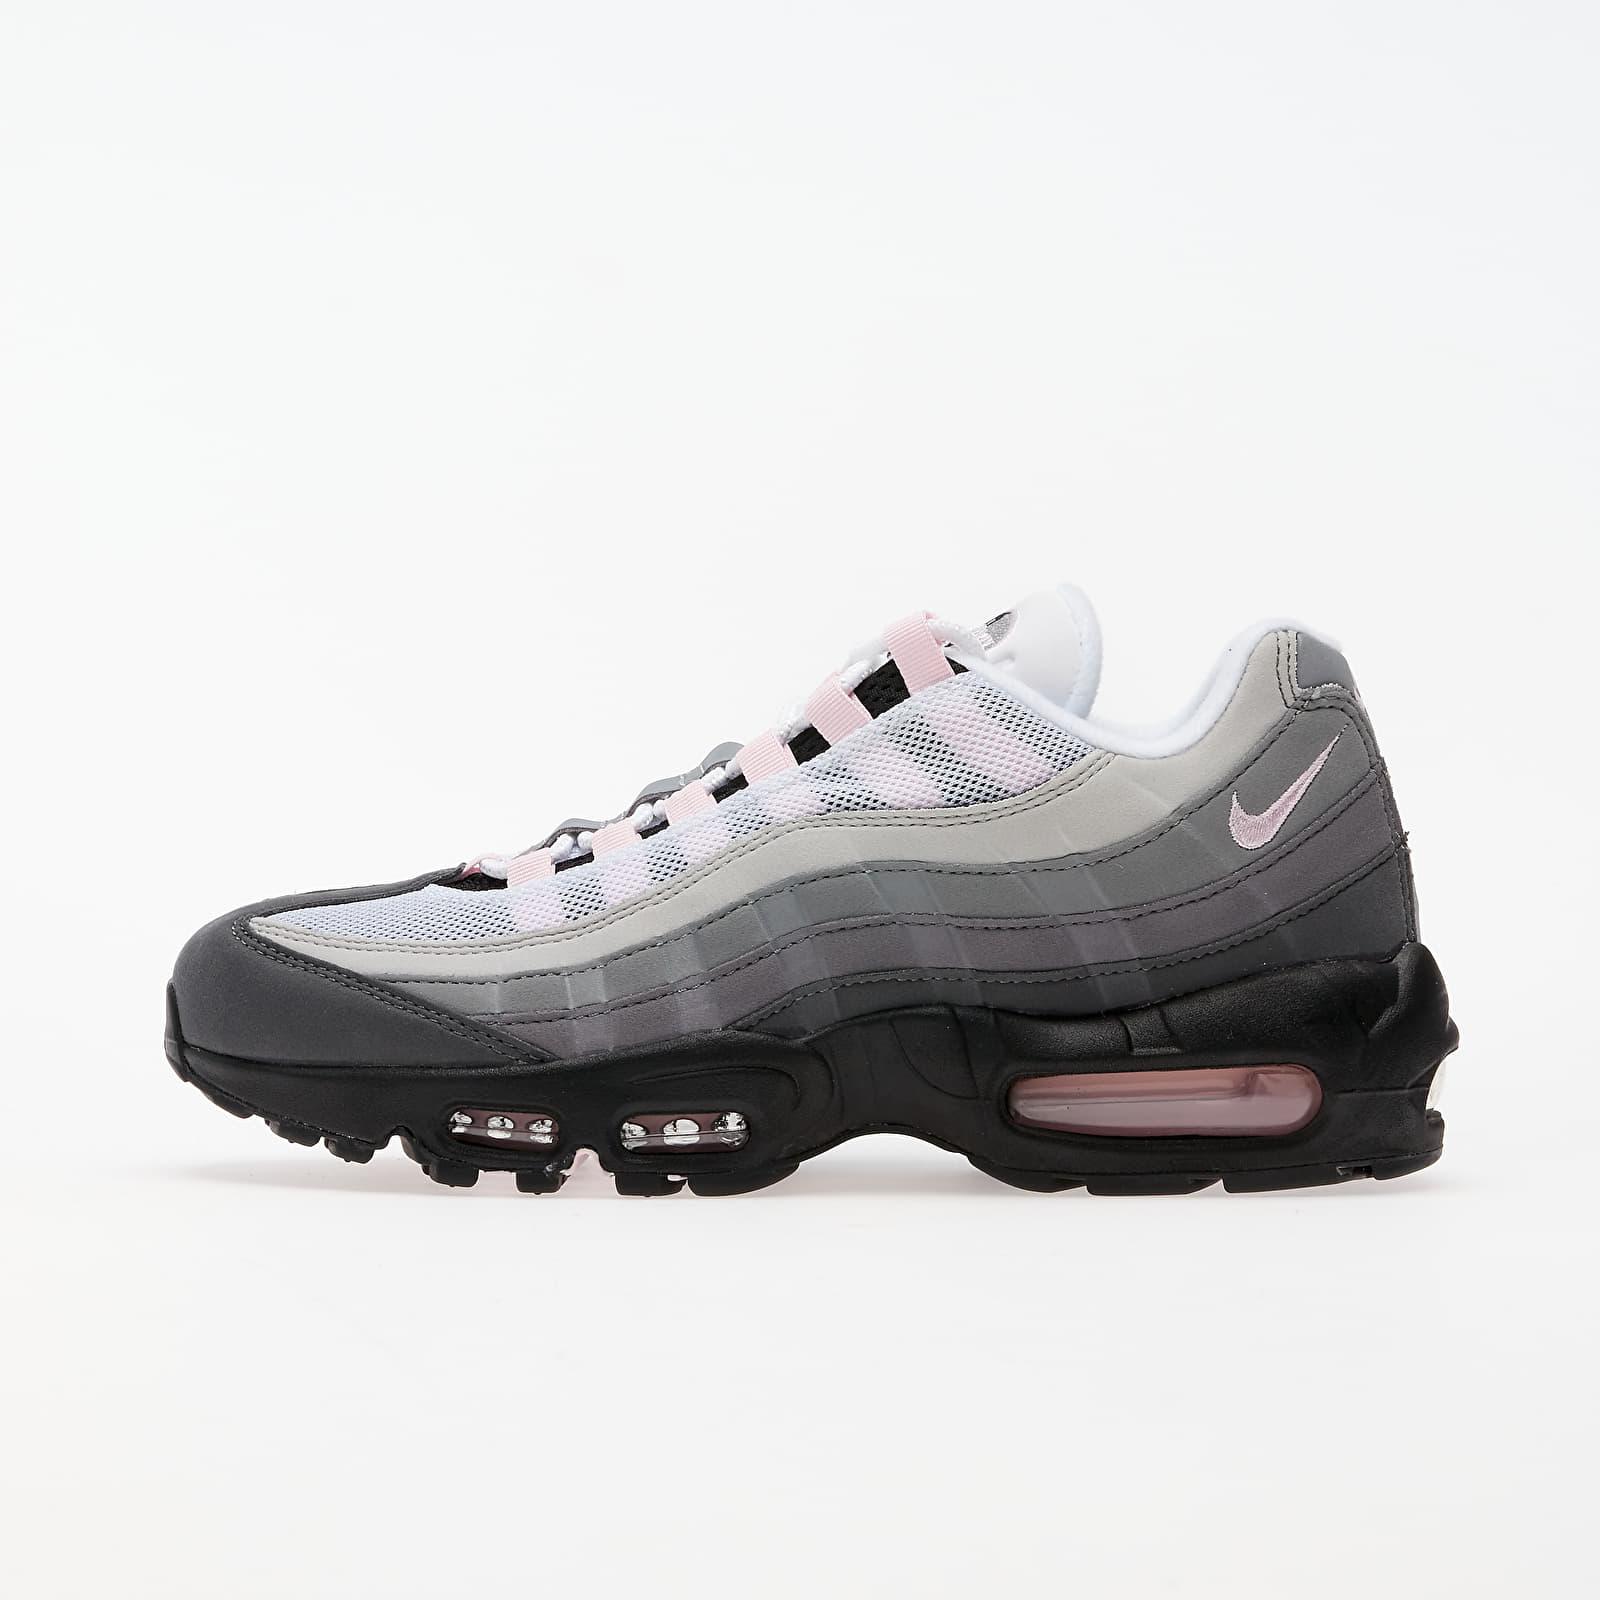 Nike Air Max 95 Premium Black/ Pink Foam -Gunsmoke-Grey Fog | Footshop